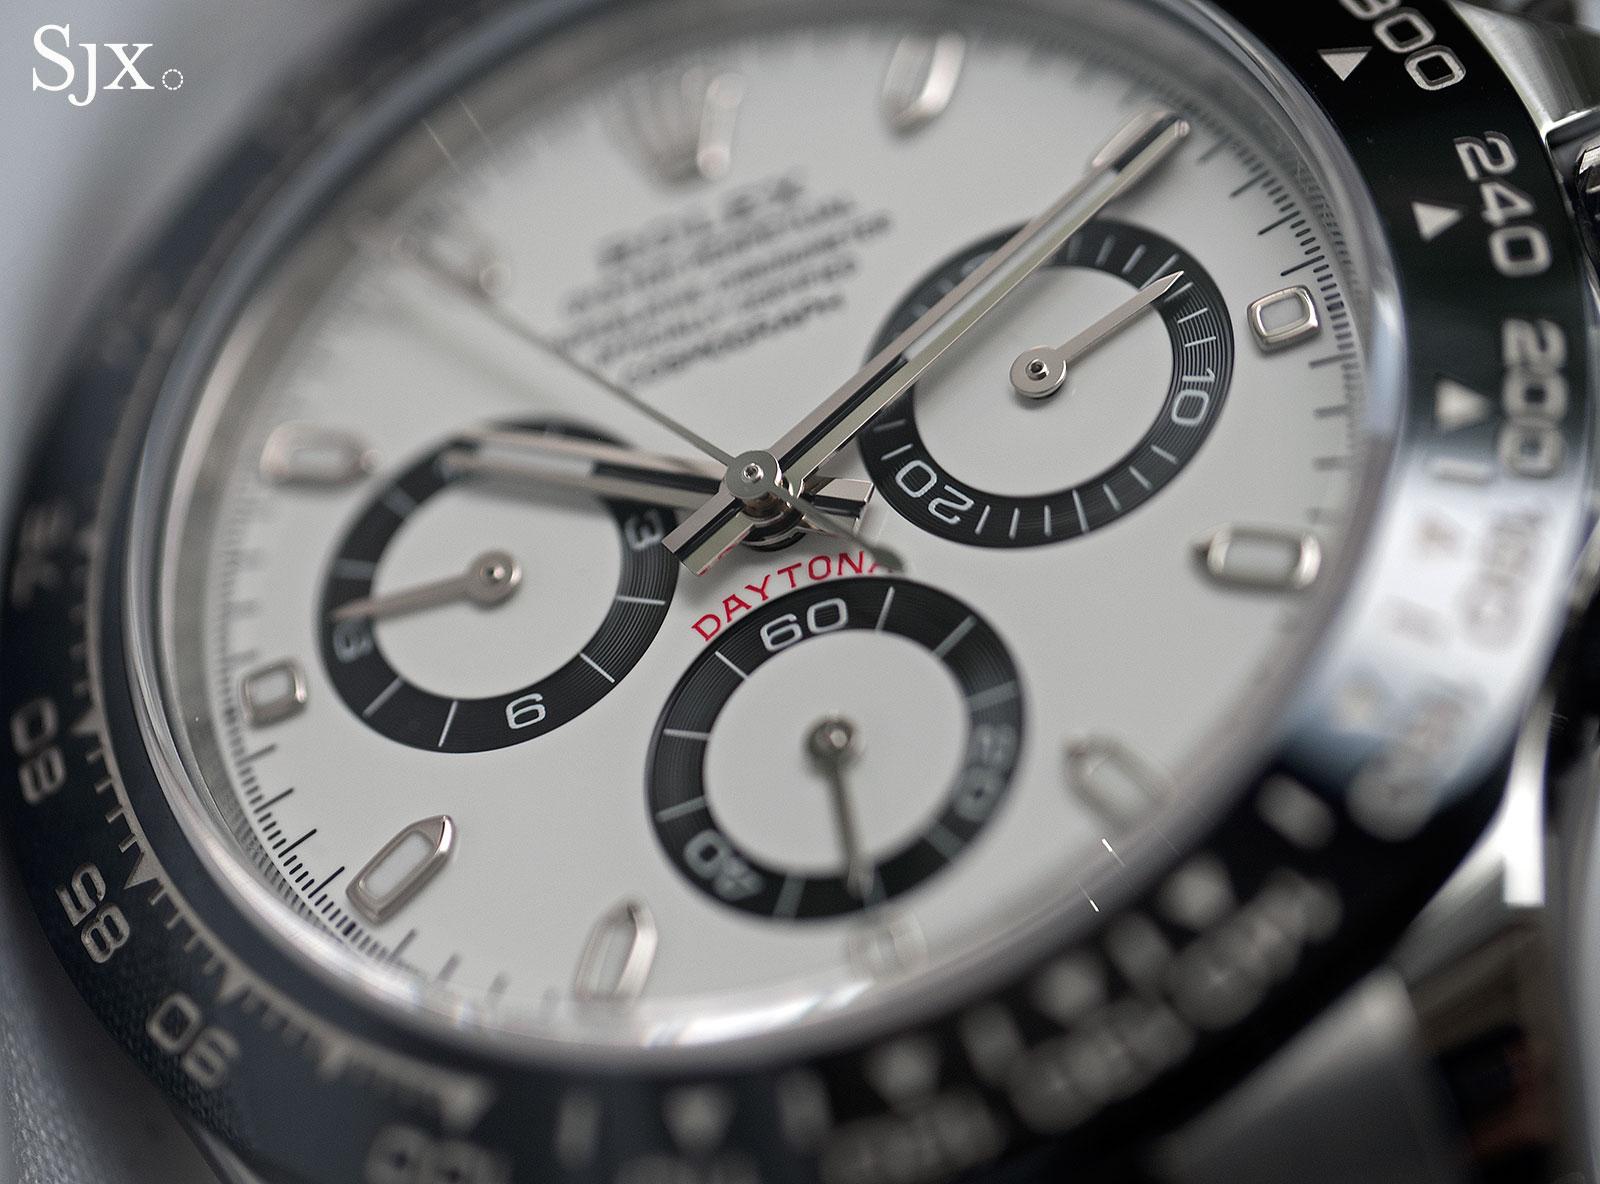 Rolex Daytona Ceramic White Dial 116500LN - 2